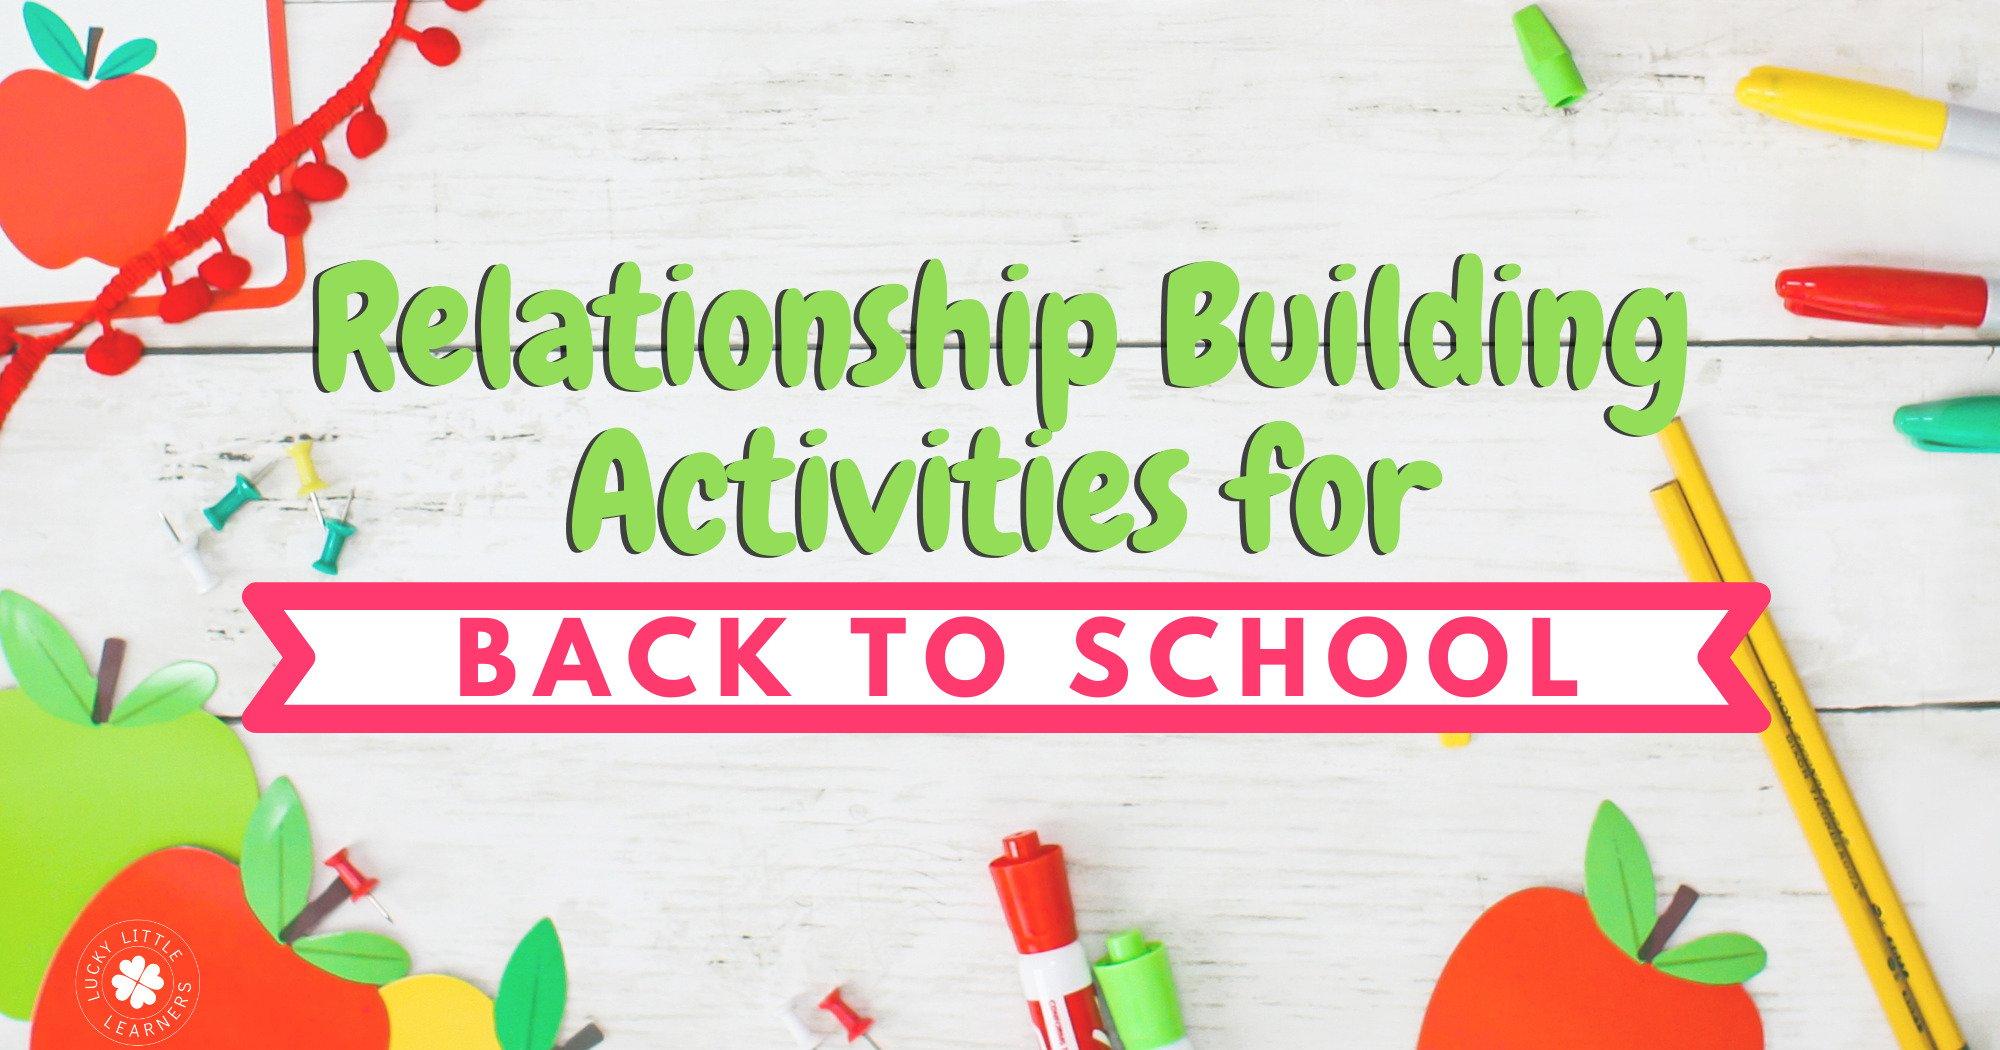 Relationship Building Activities for Back to School